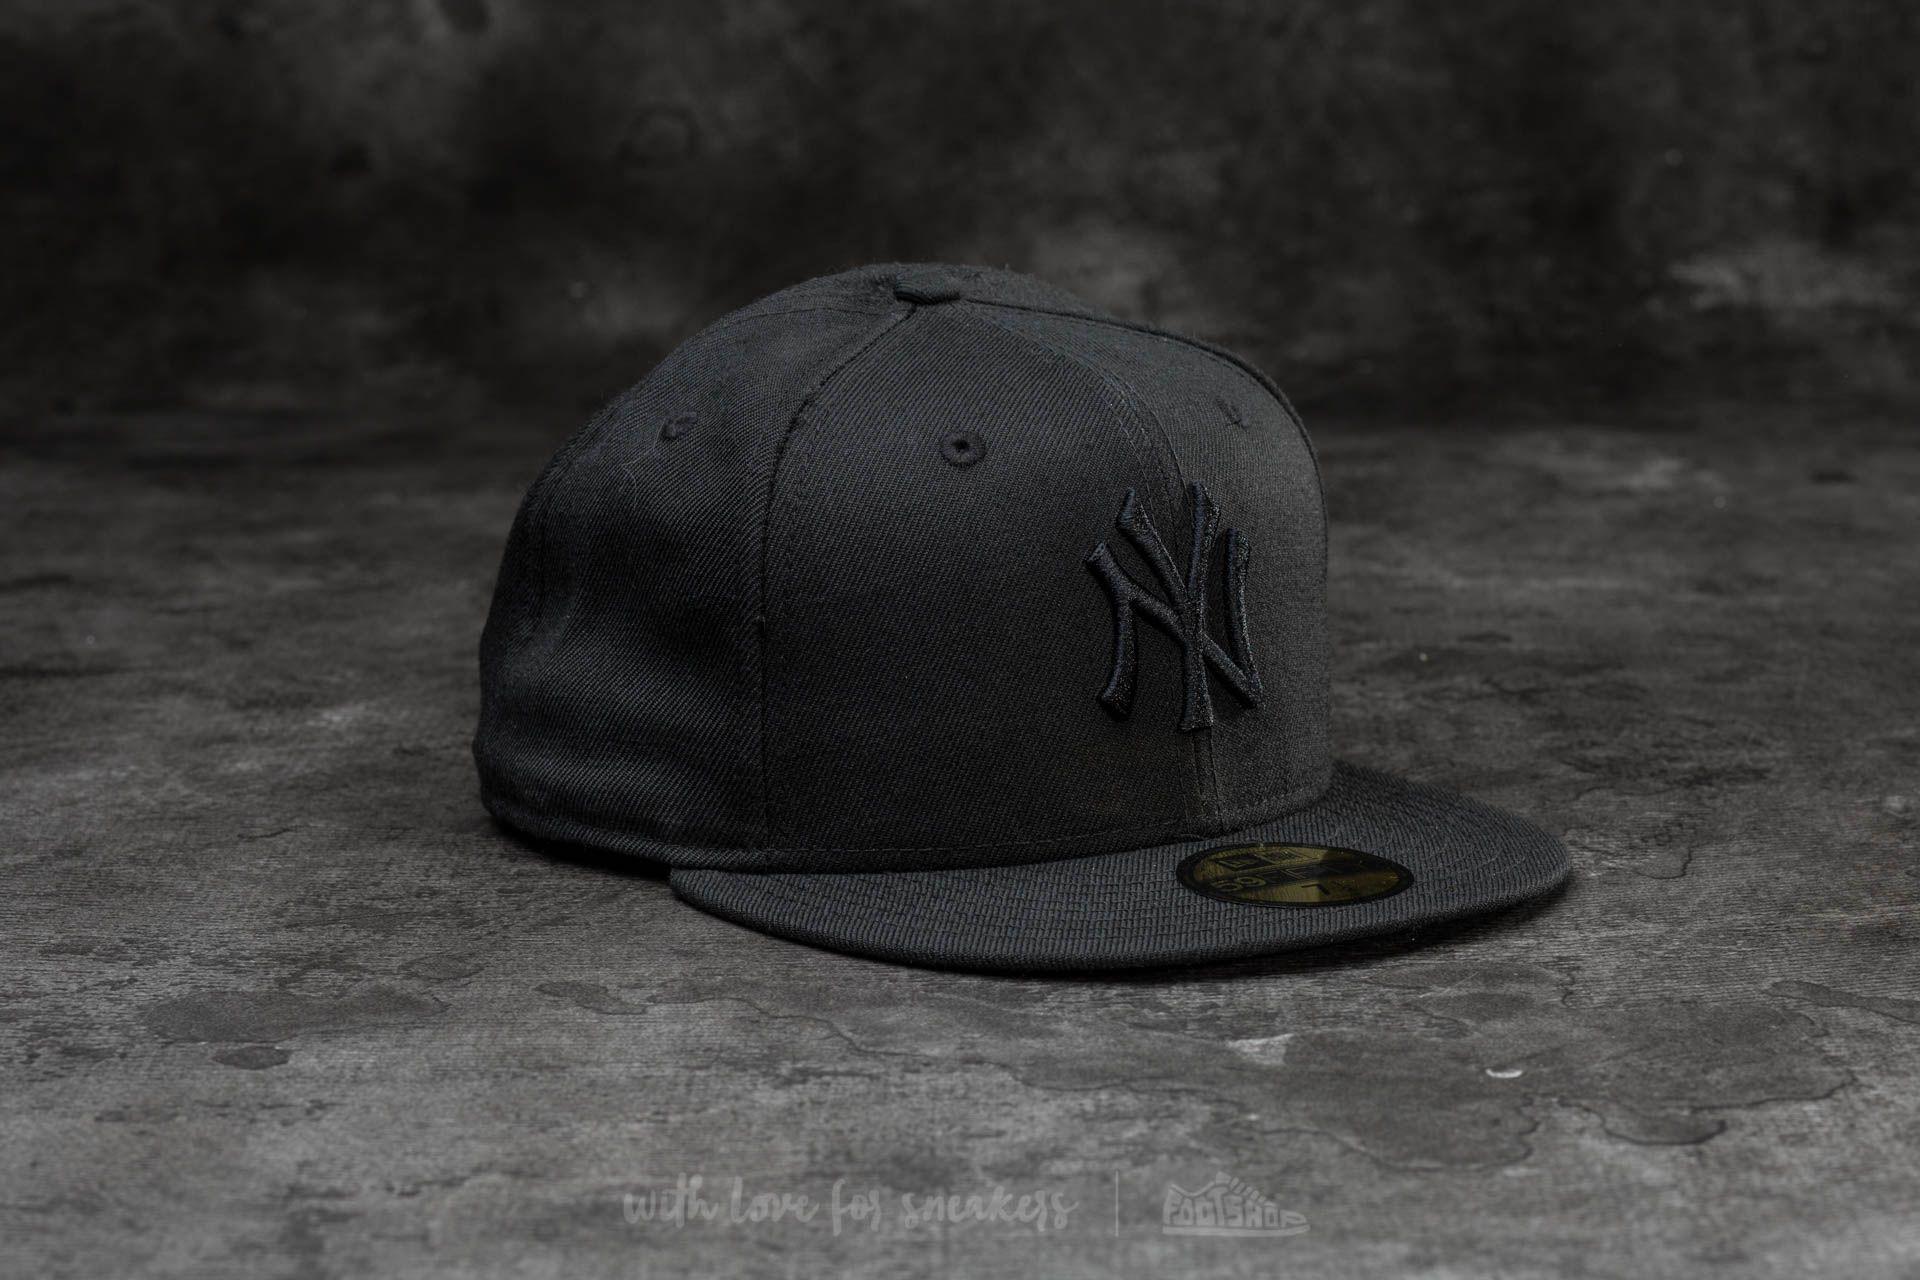 91a45742ff7 ... buy ktz. mens 59fifty black on black new york yankees cap black 97cea  83bb3 ...